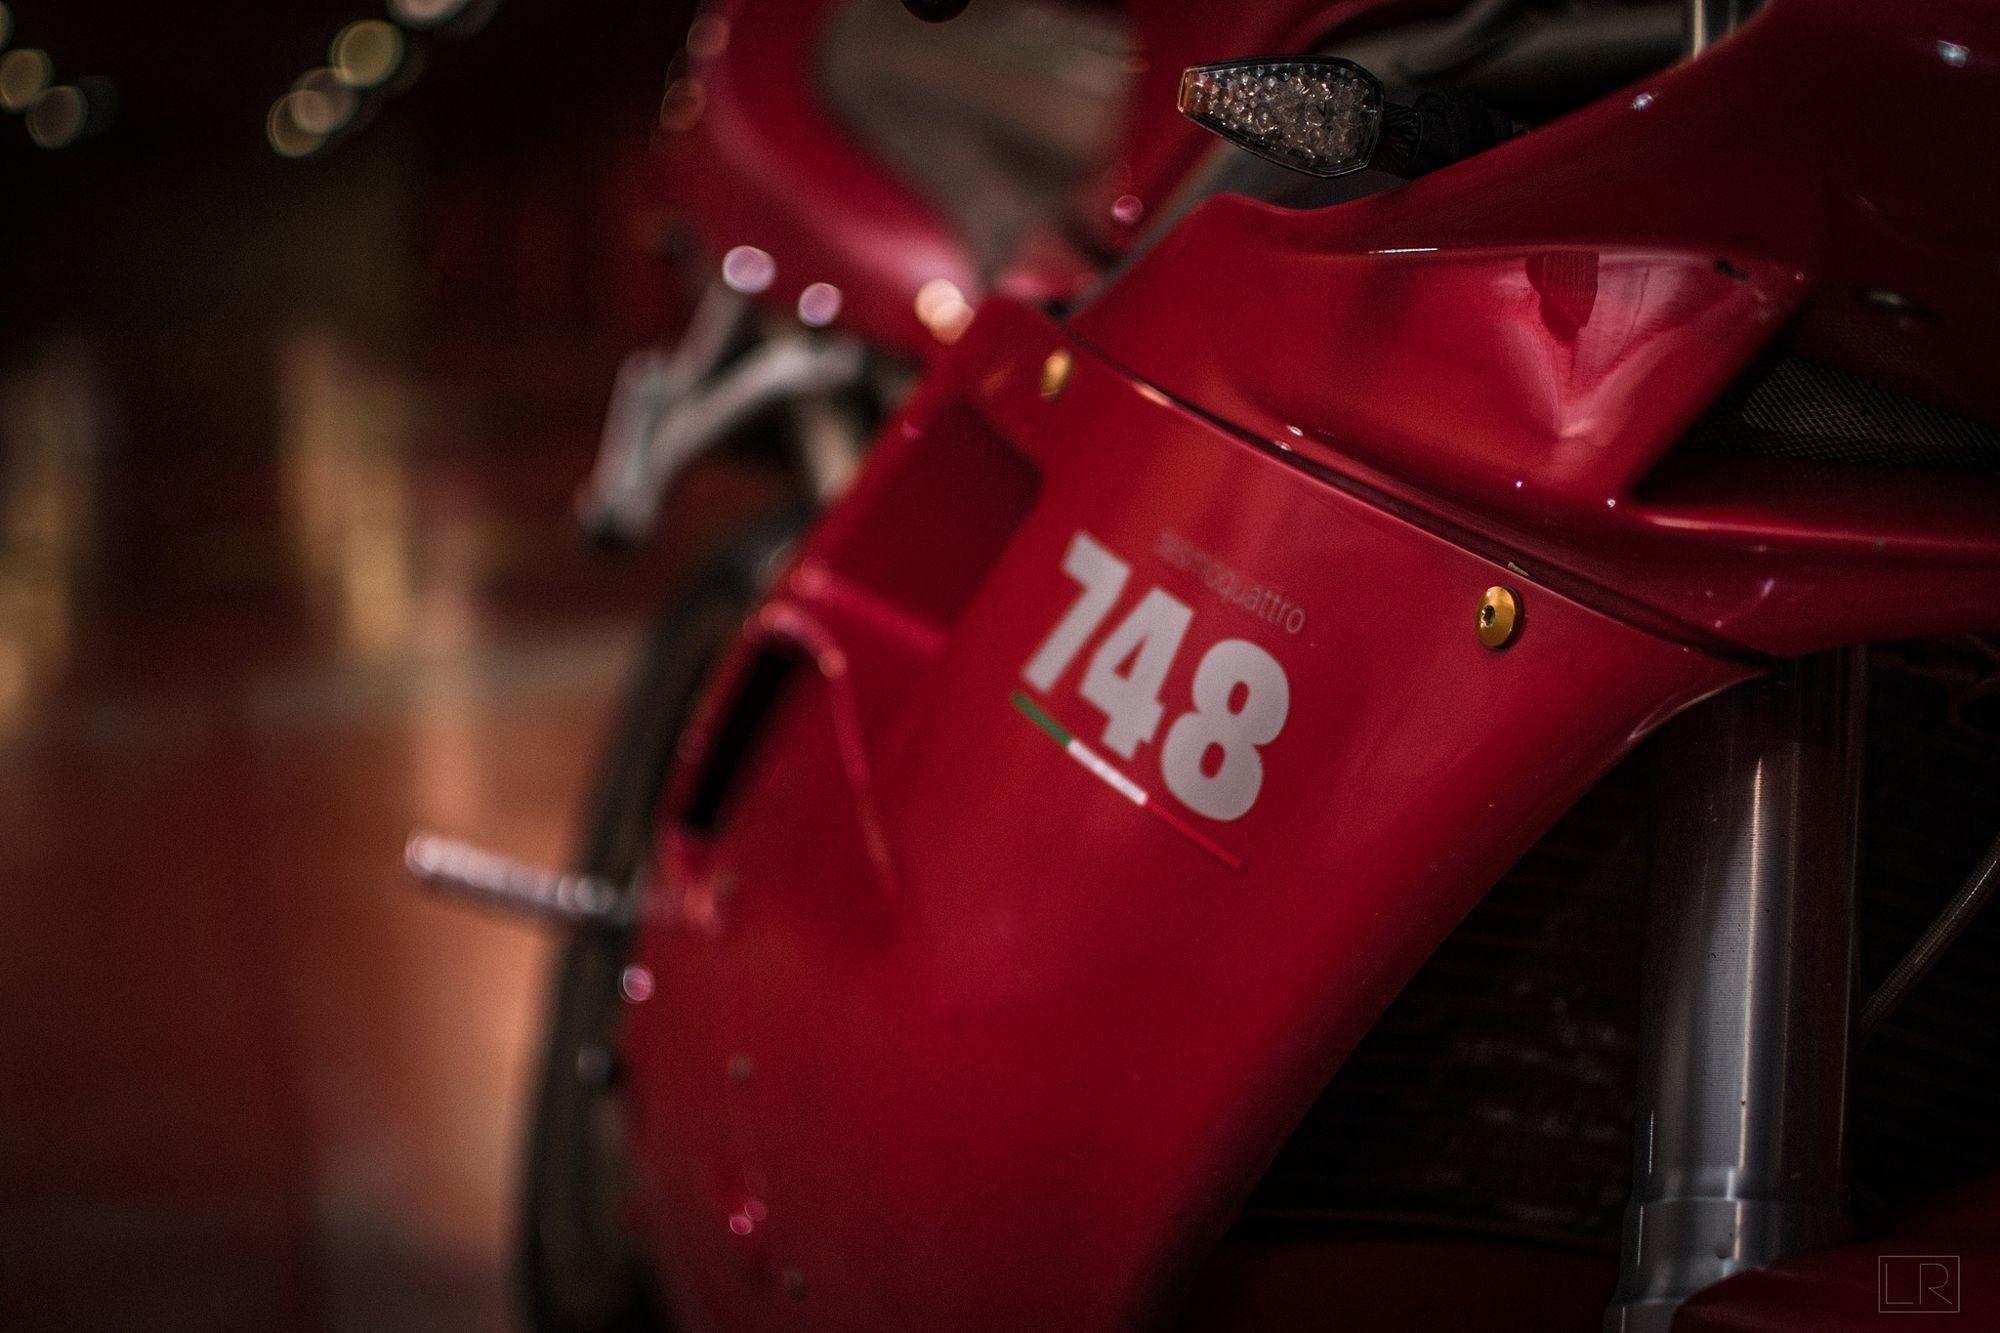 Ducati 748 Gallsourcecom Ducati 916 Ducati 748